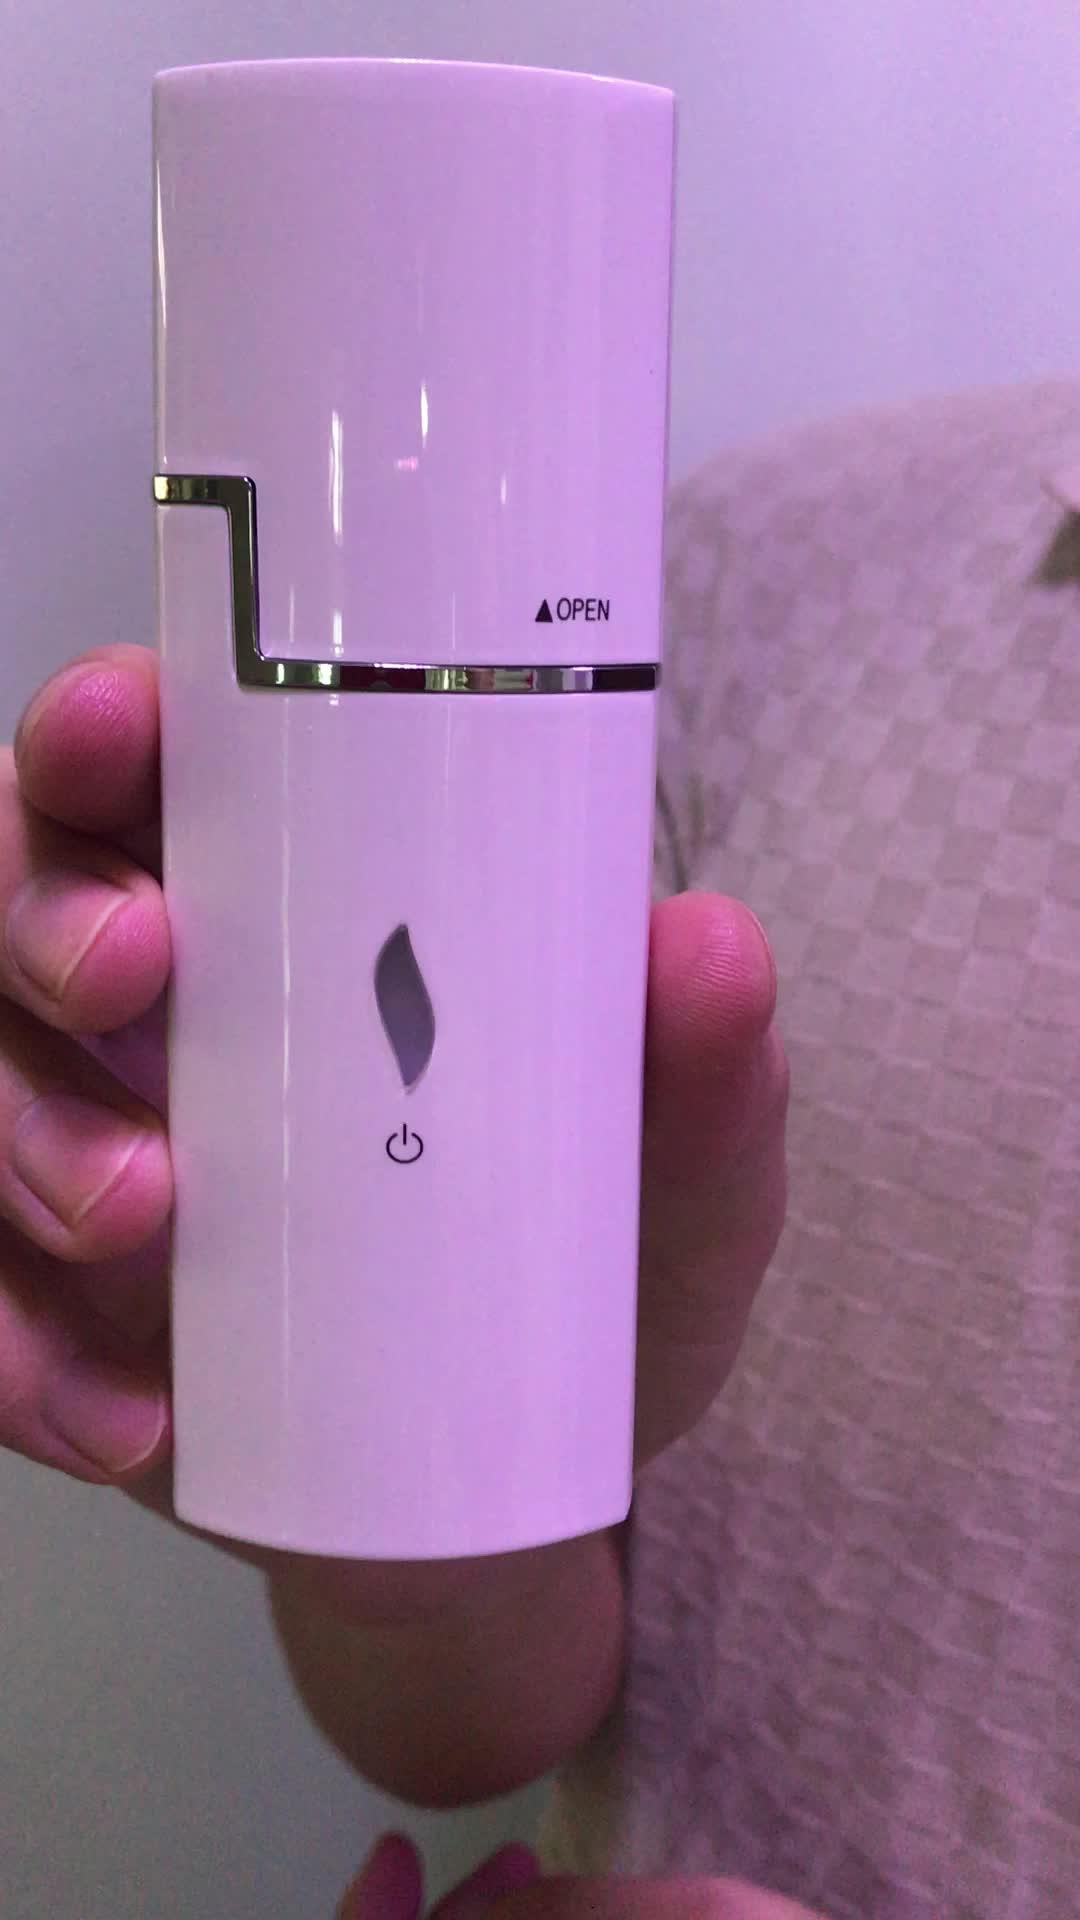 Mini-Nano-Spray handlicher Nebel, neueste Gesichtsschönheit handlicher Sprühnebel / Gesichtsschönheitssprüher